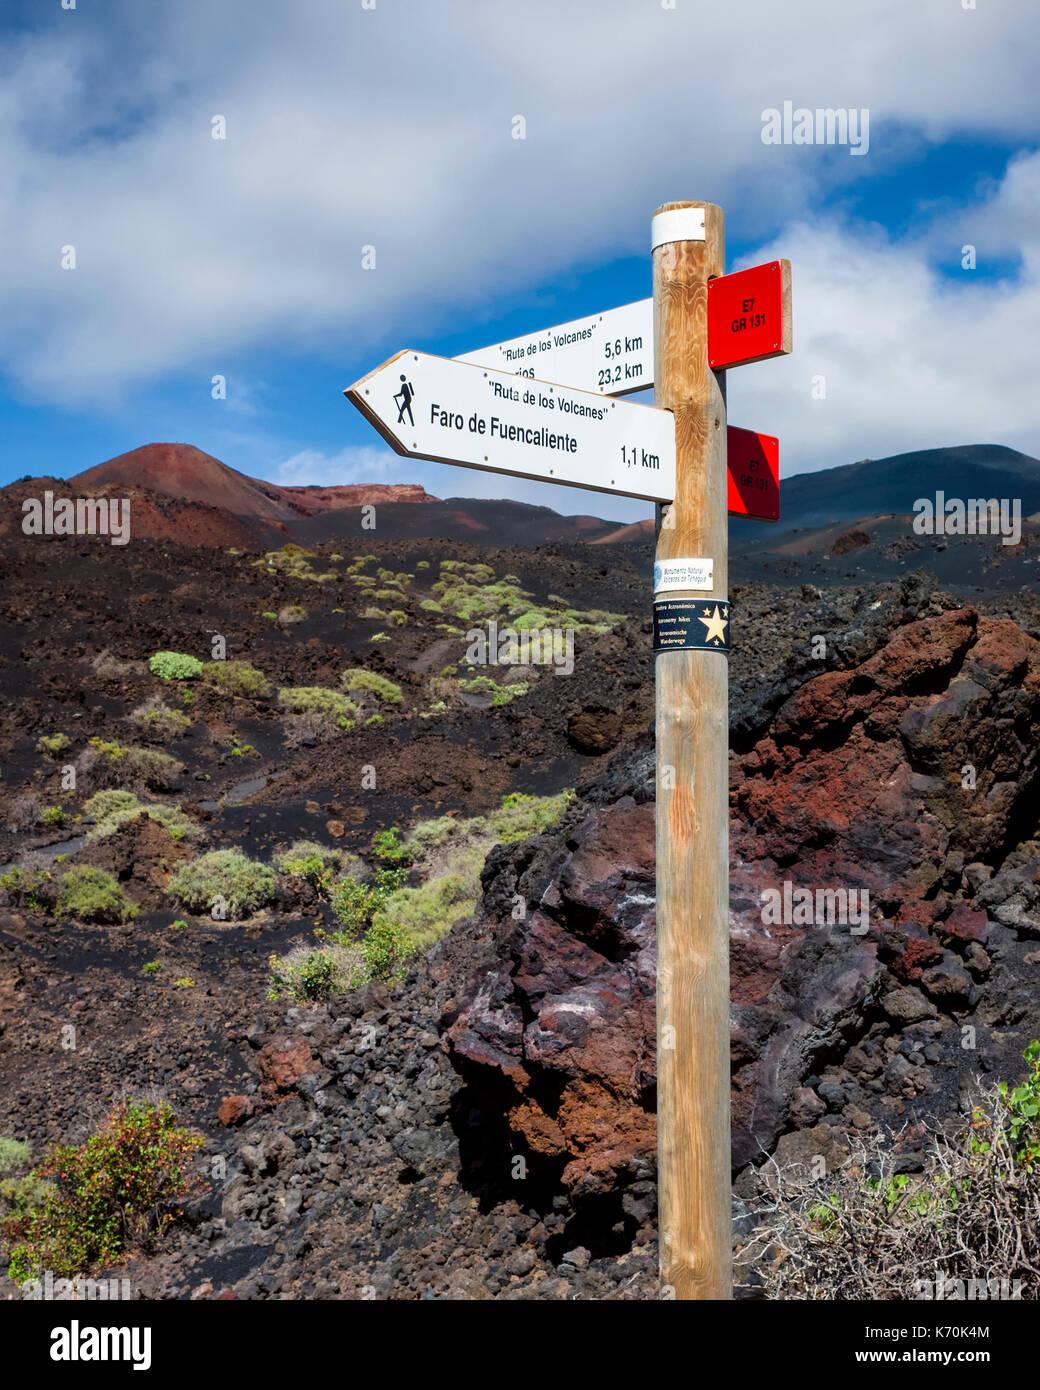 Los Volcanes de Teneguía, Cumbre Vieja. La Palma.  National Park sign post E7, GR131, showing the 'Ruta de los Volcanes' and 'Ruta de los Volcanes' for hikers on one of the red routes. - Stock Image